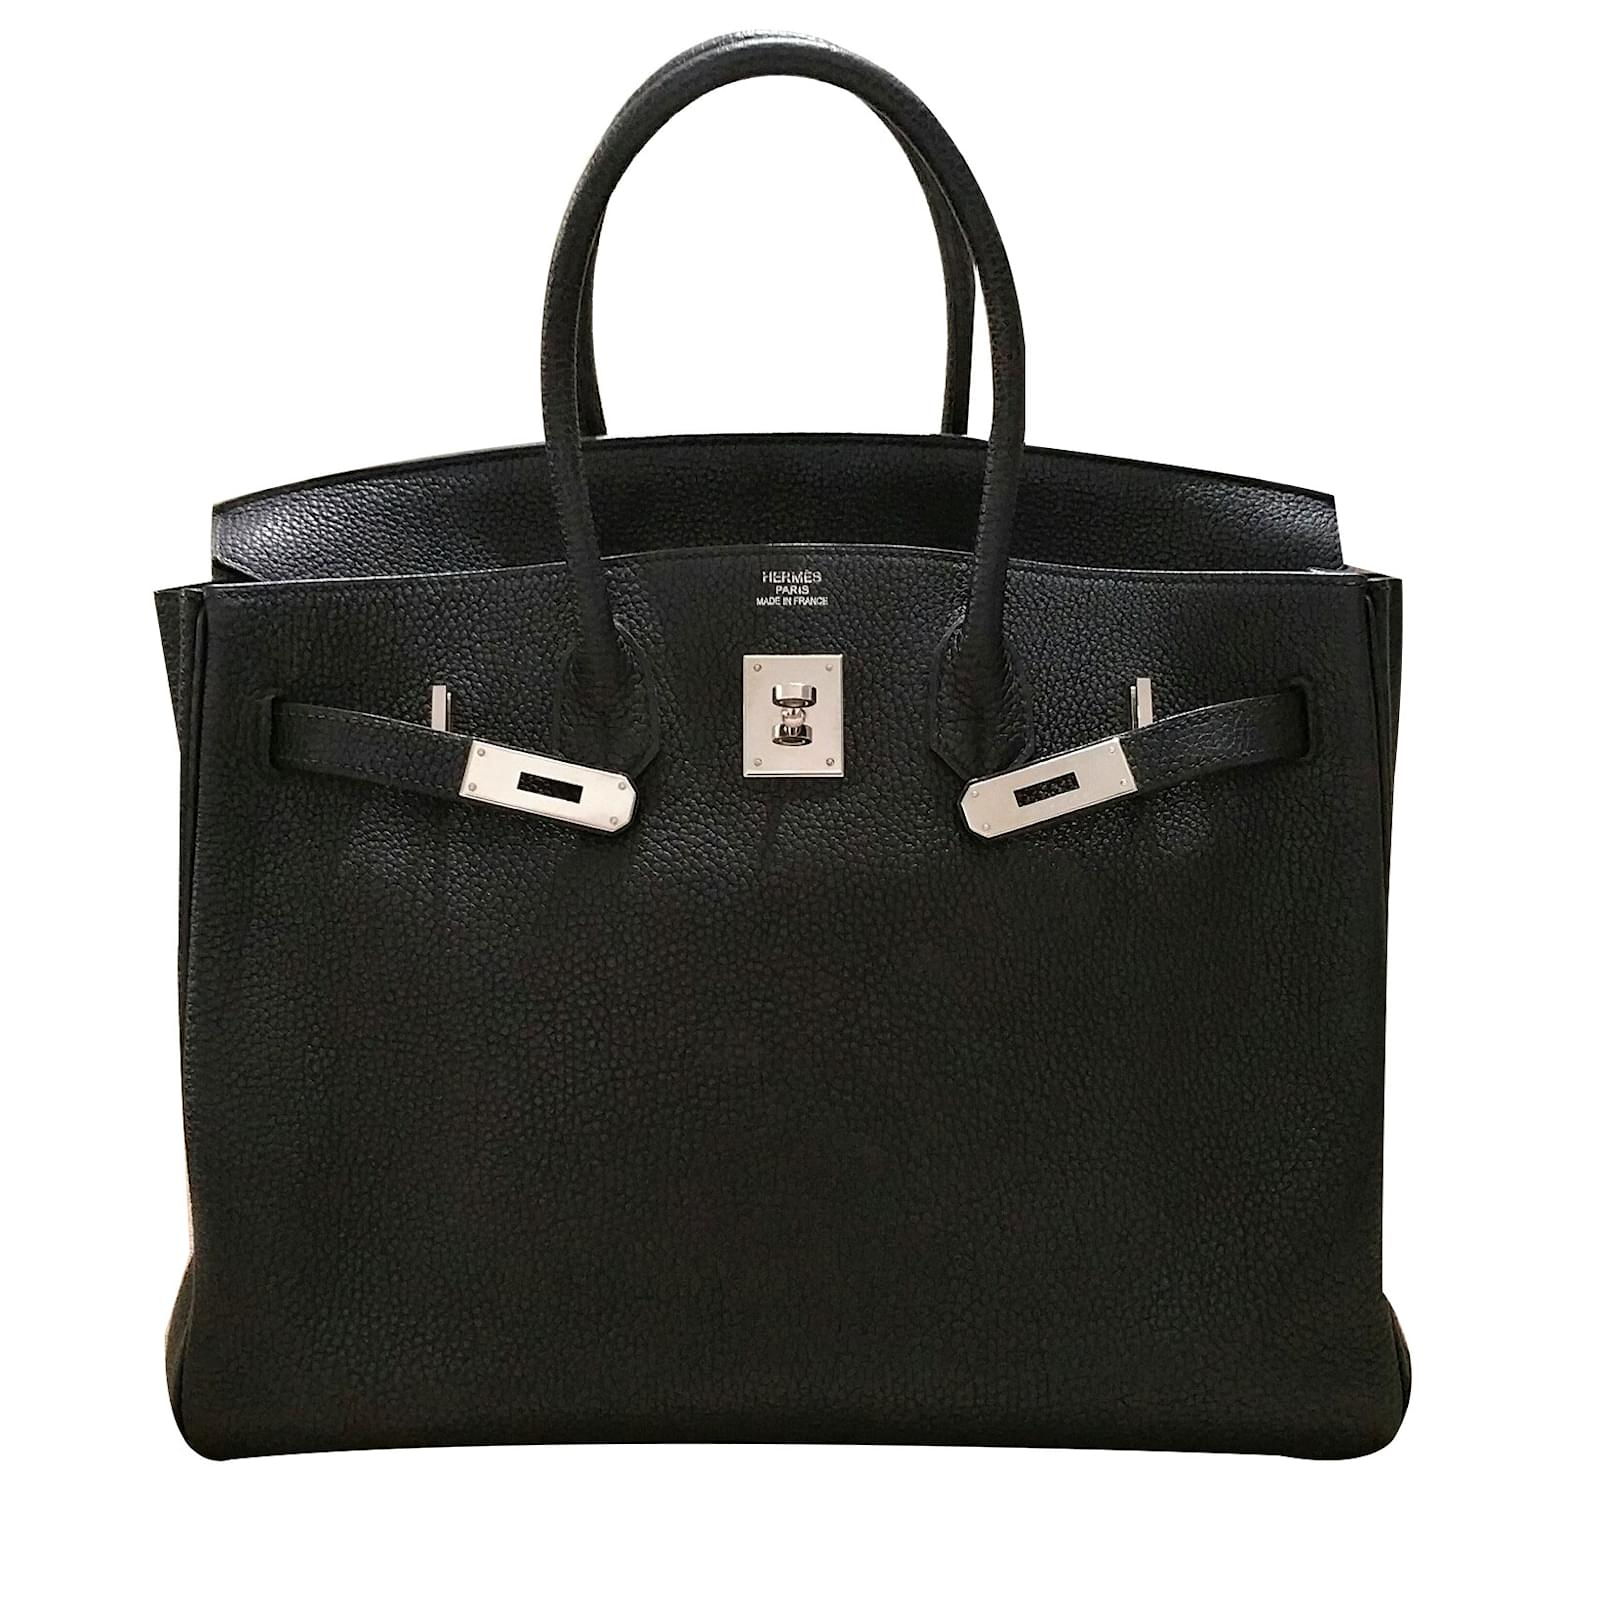 b9c79188fb8 Hermes Birkin 35 Bag Togo Leather